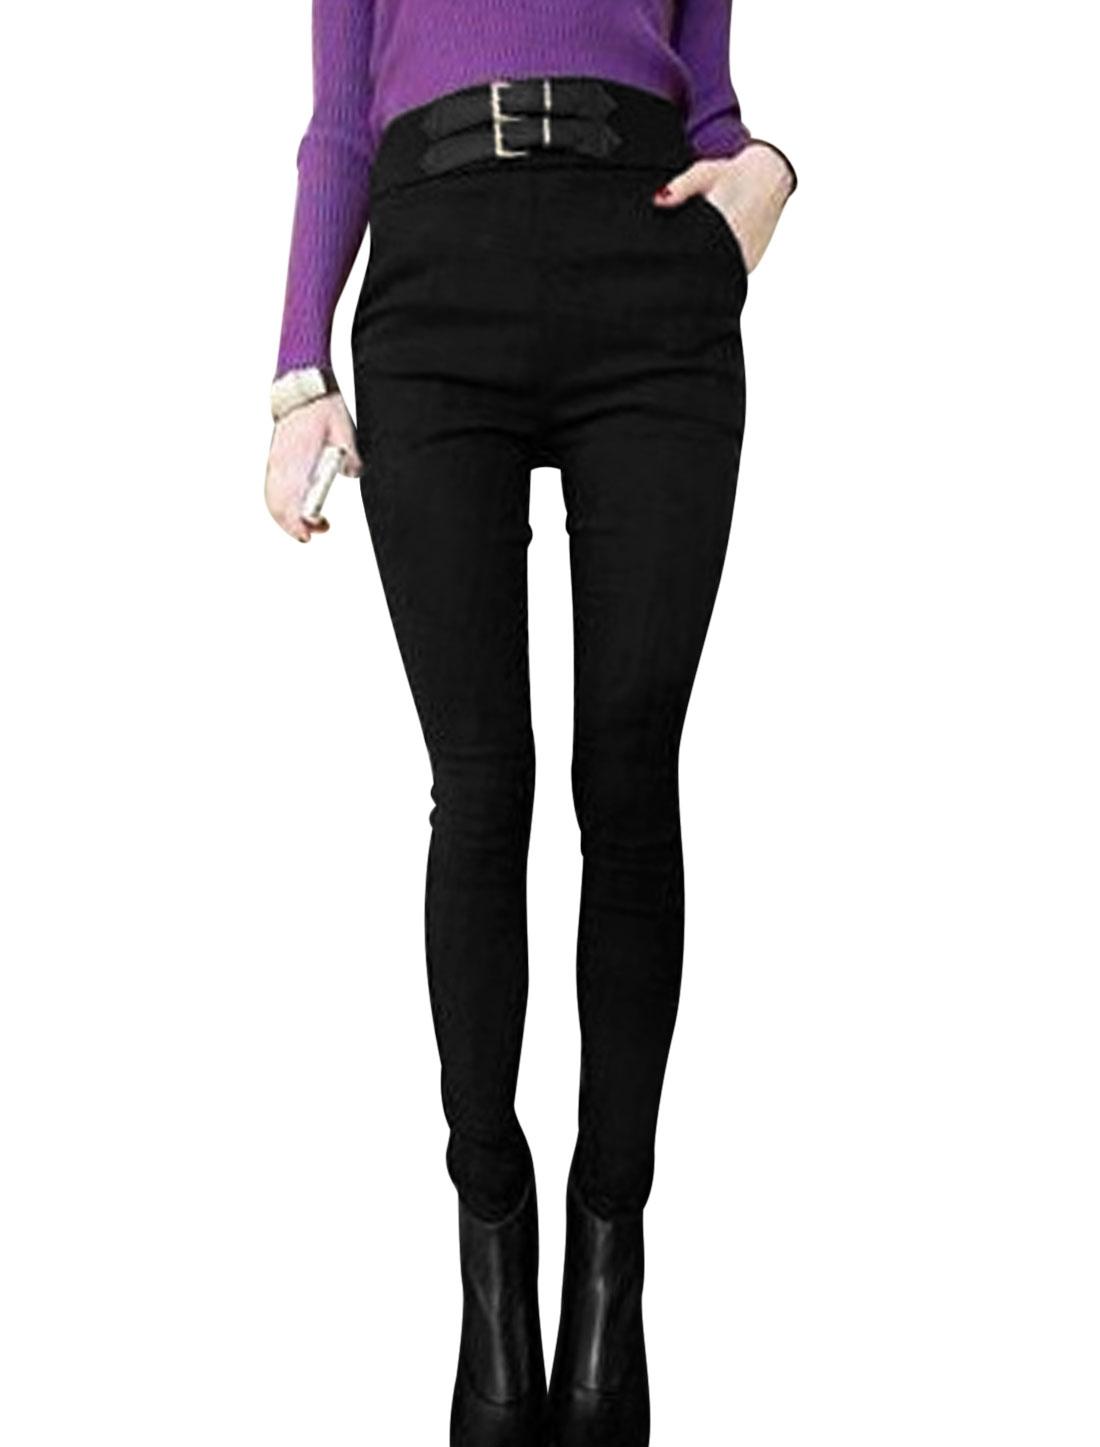 Lady Elastic Waist Buckle-Belt Decor Slant Pockets Pencil Pants Black XS